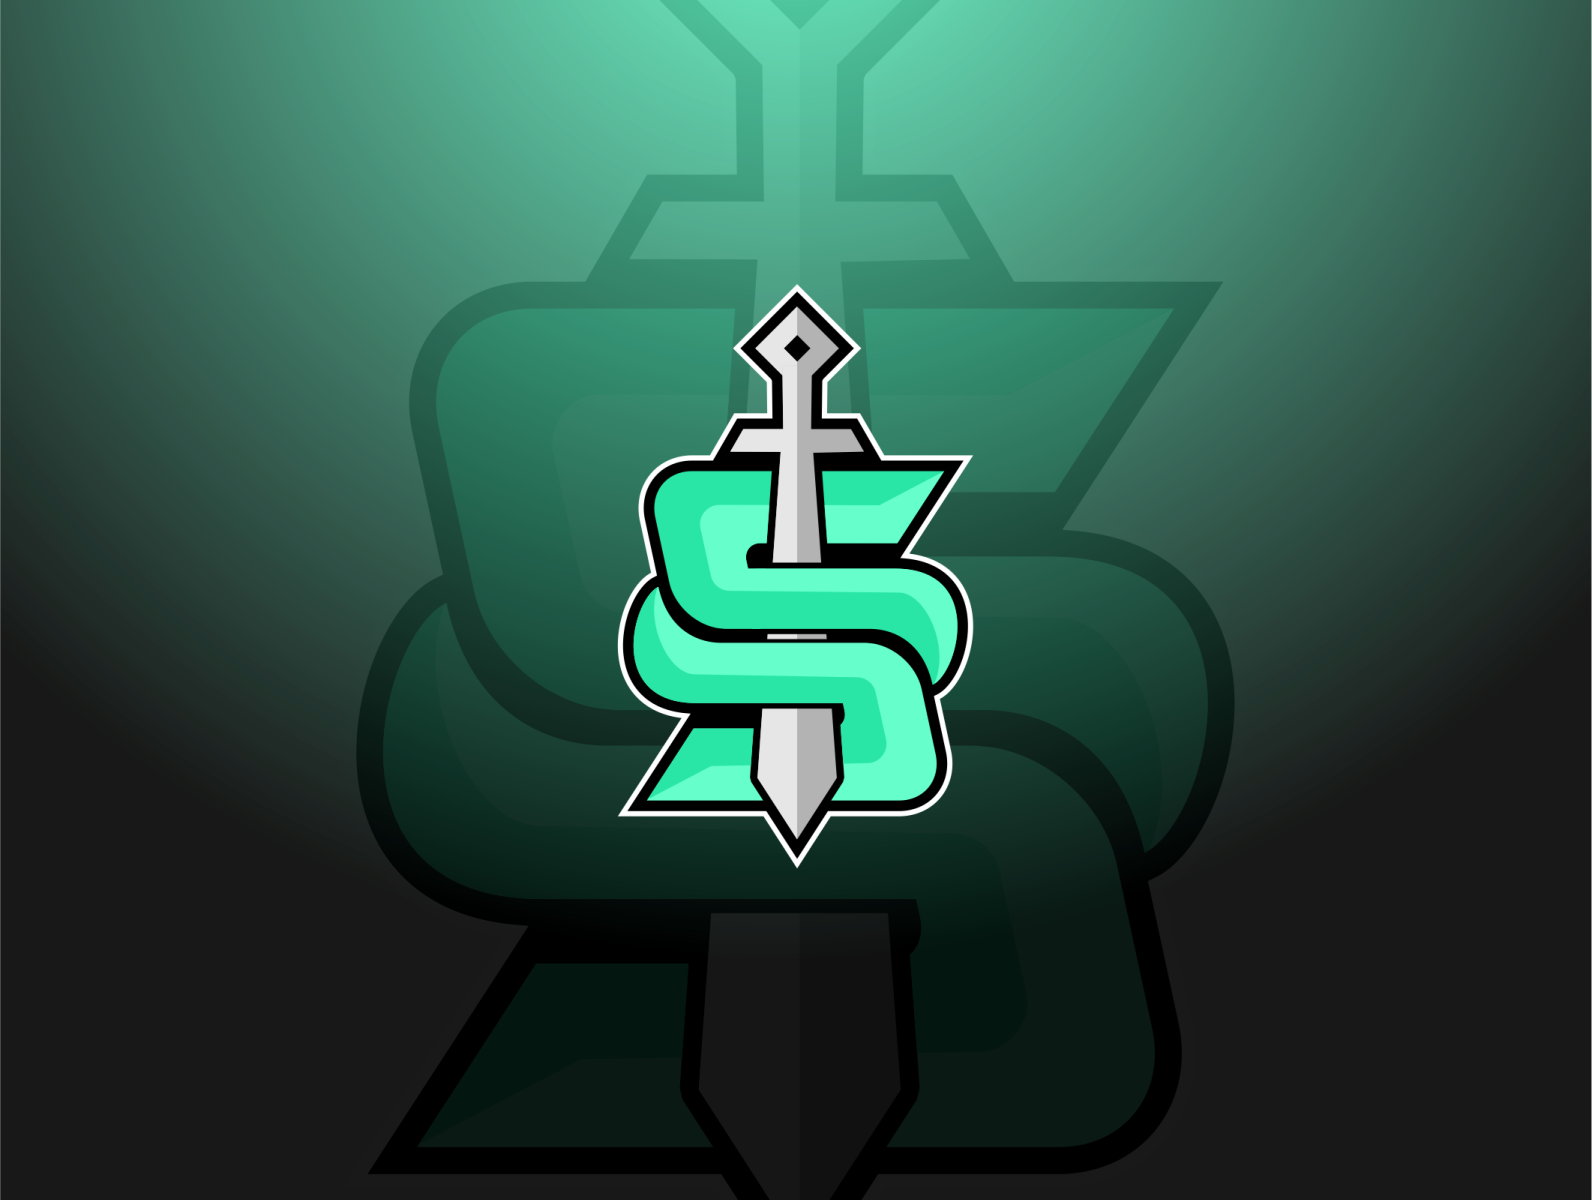 ov esport initial logo in 2020 Initials logo, Initials